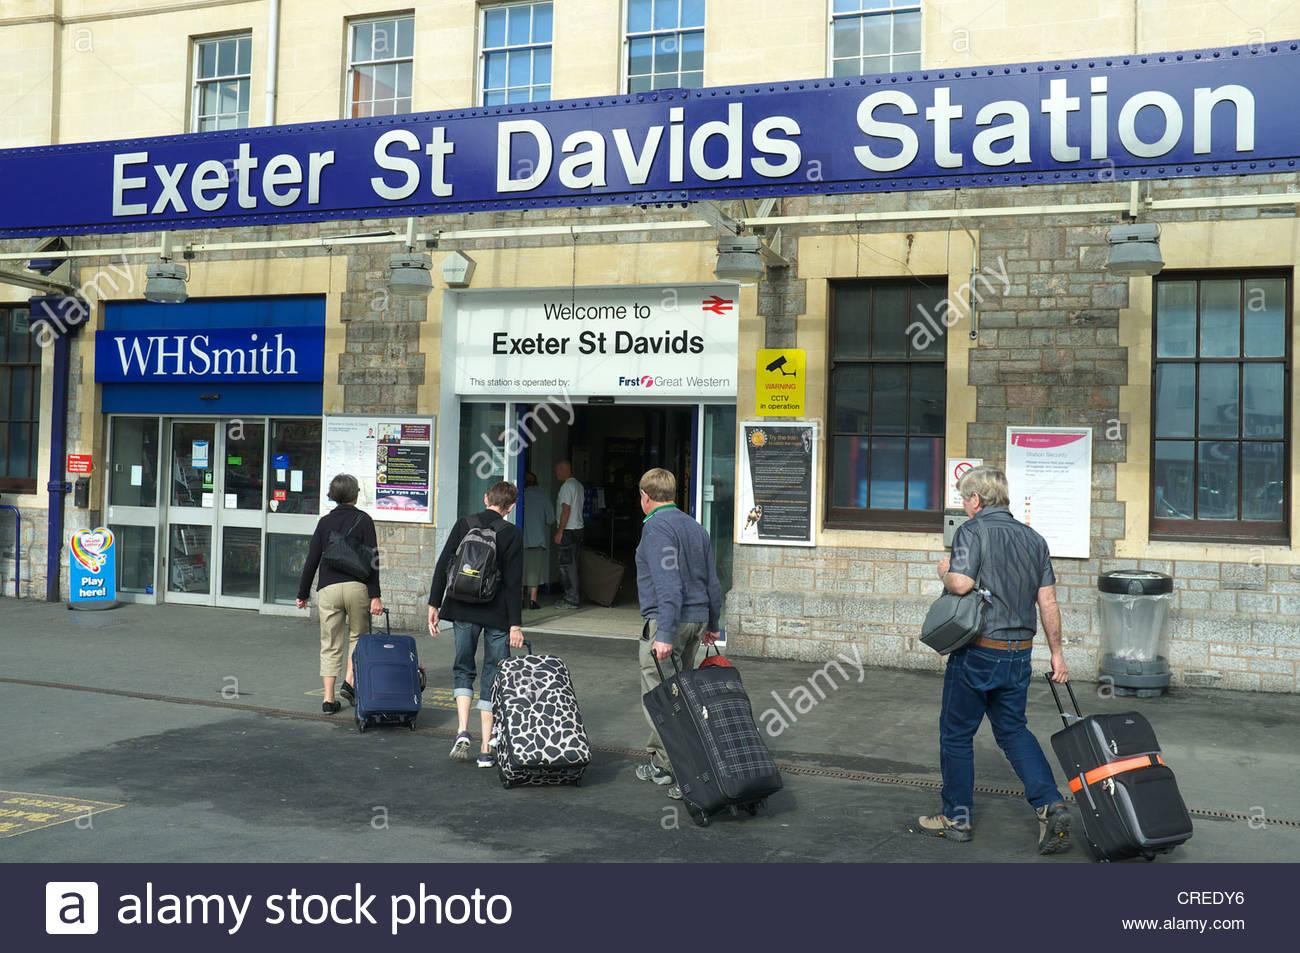 Exeter St.Davids railway station entrance, Devon, UK.Stock Photo